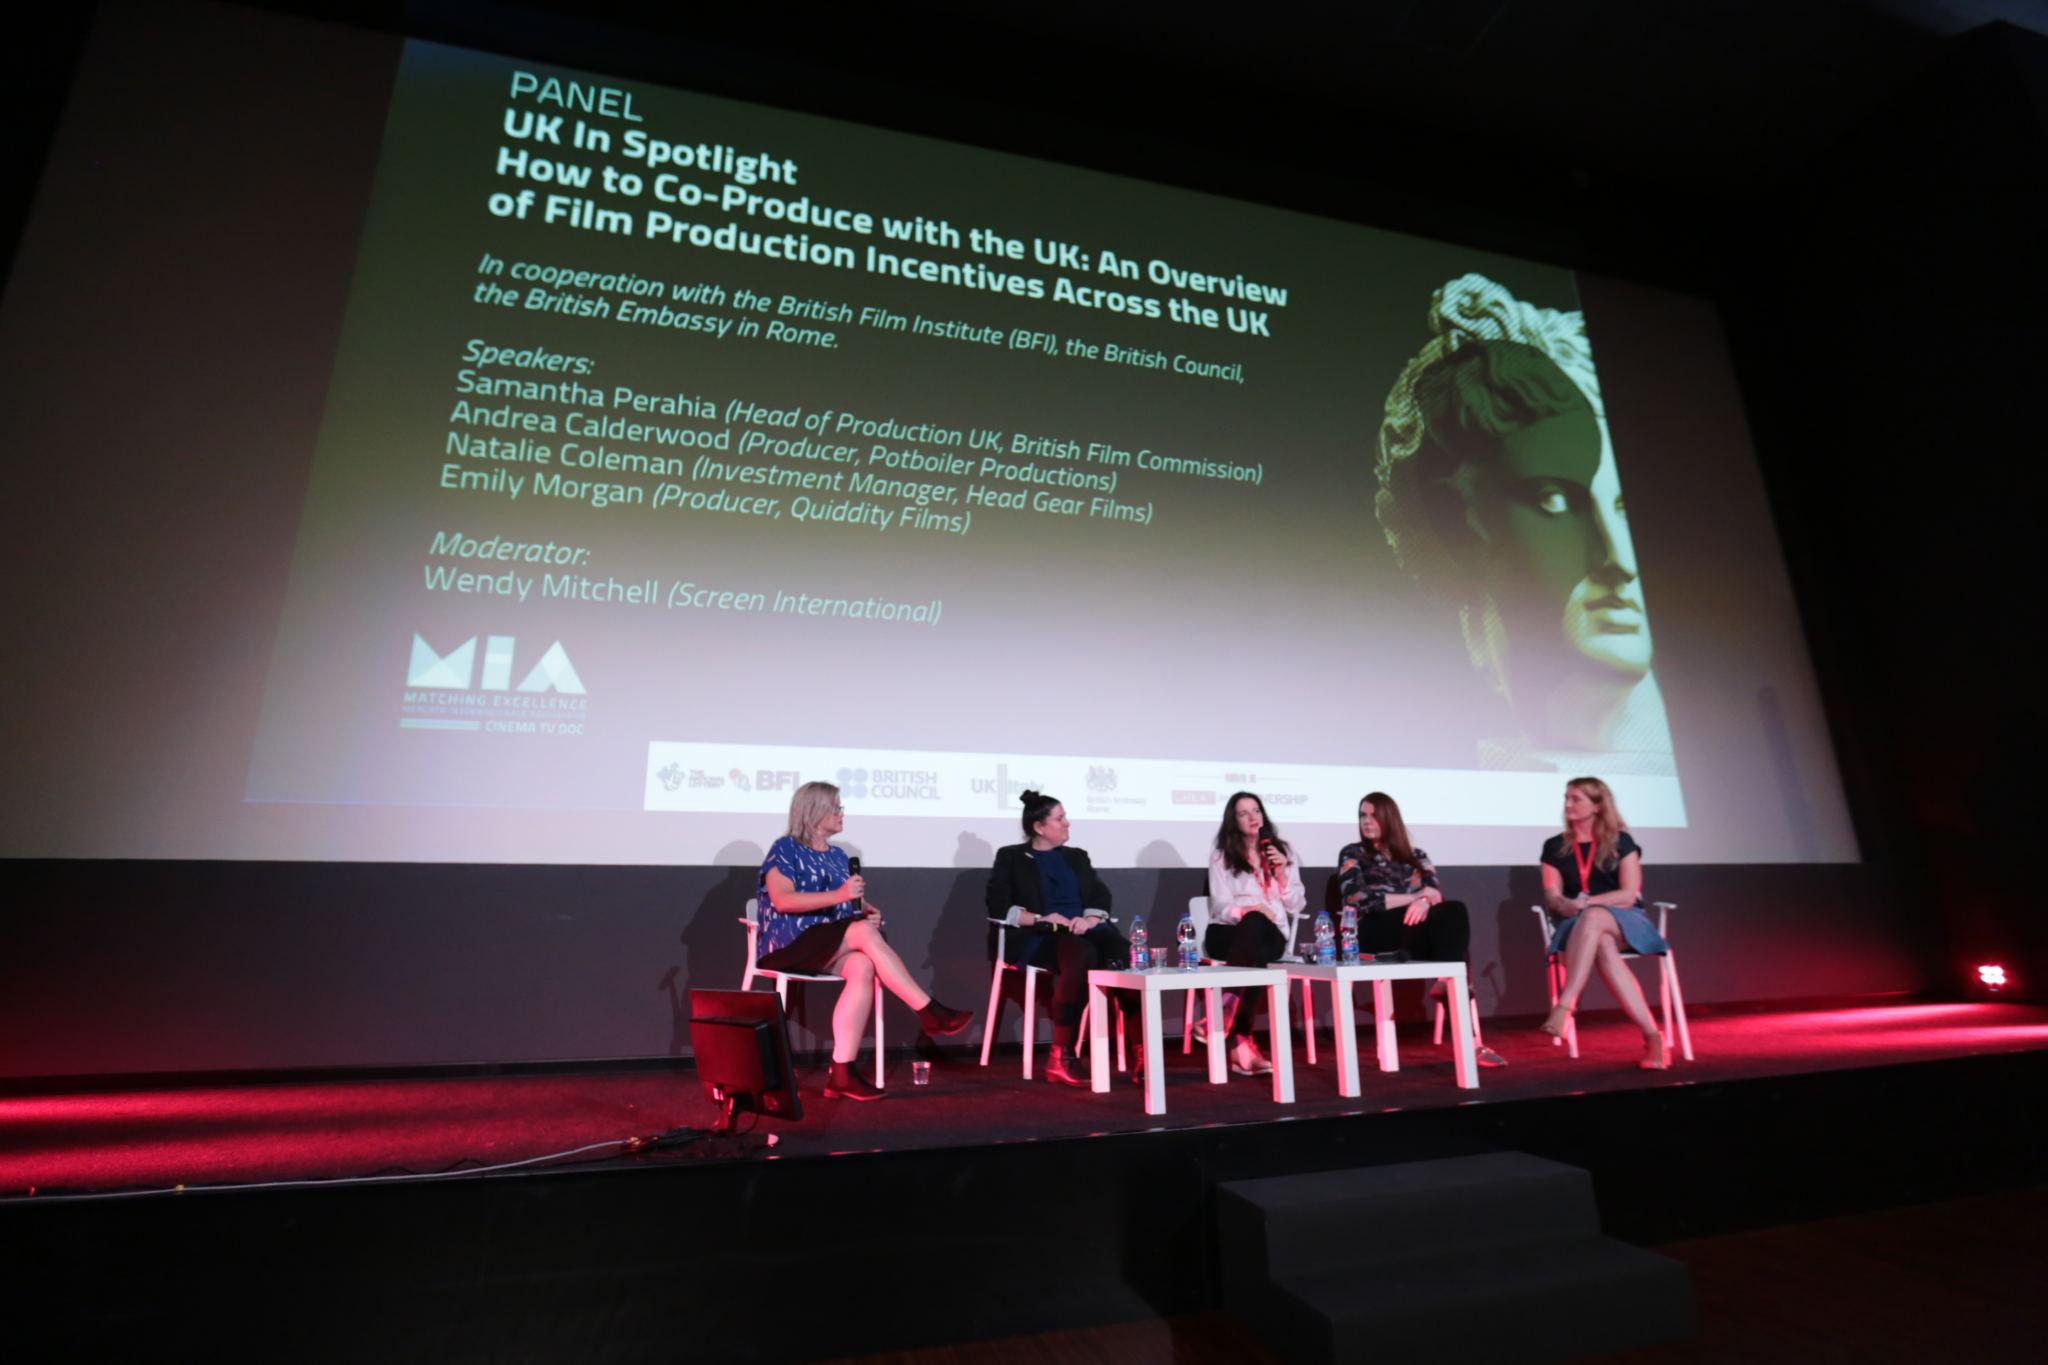 Wendy Mitchell, Samantha Perahia, Andrea Calderwood, Natalie Coleman, Emily Morgan